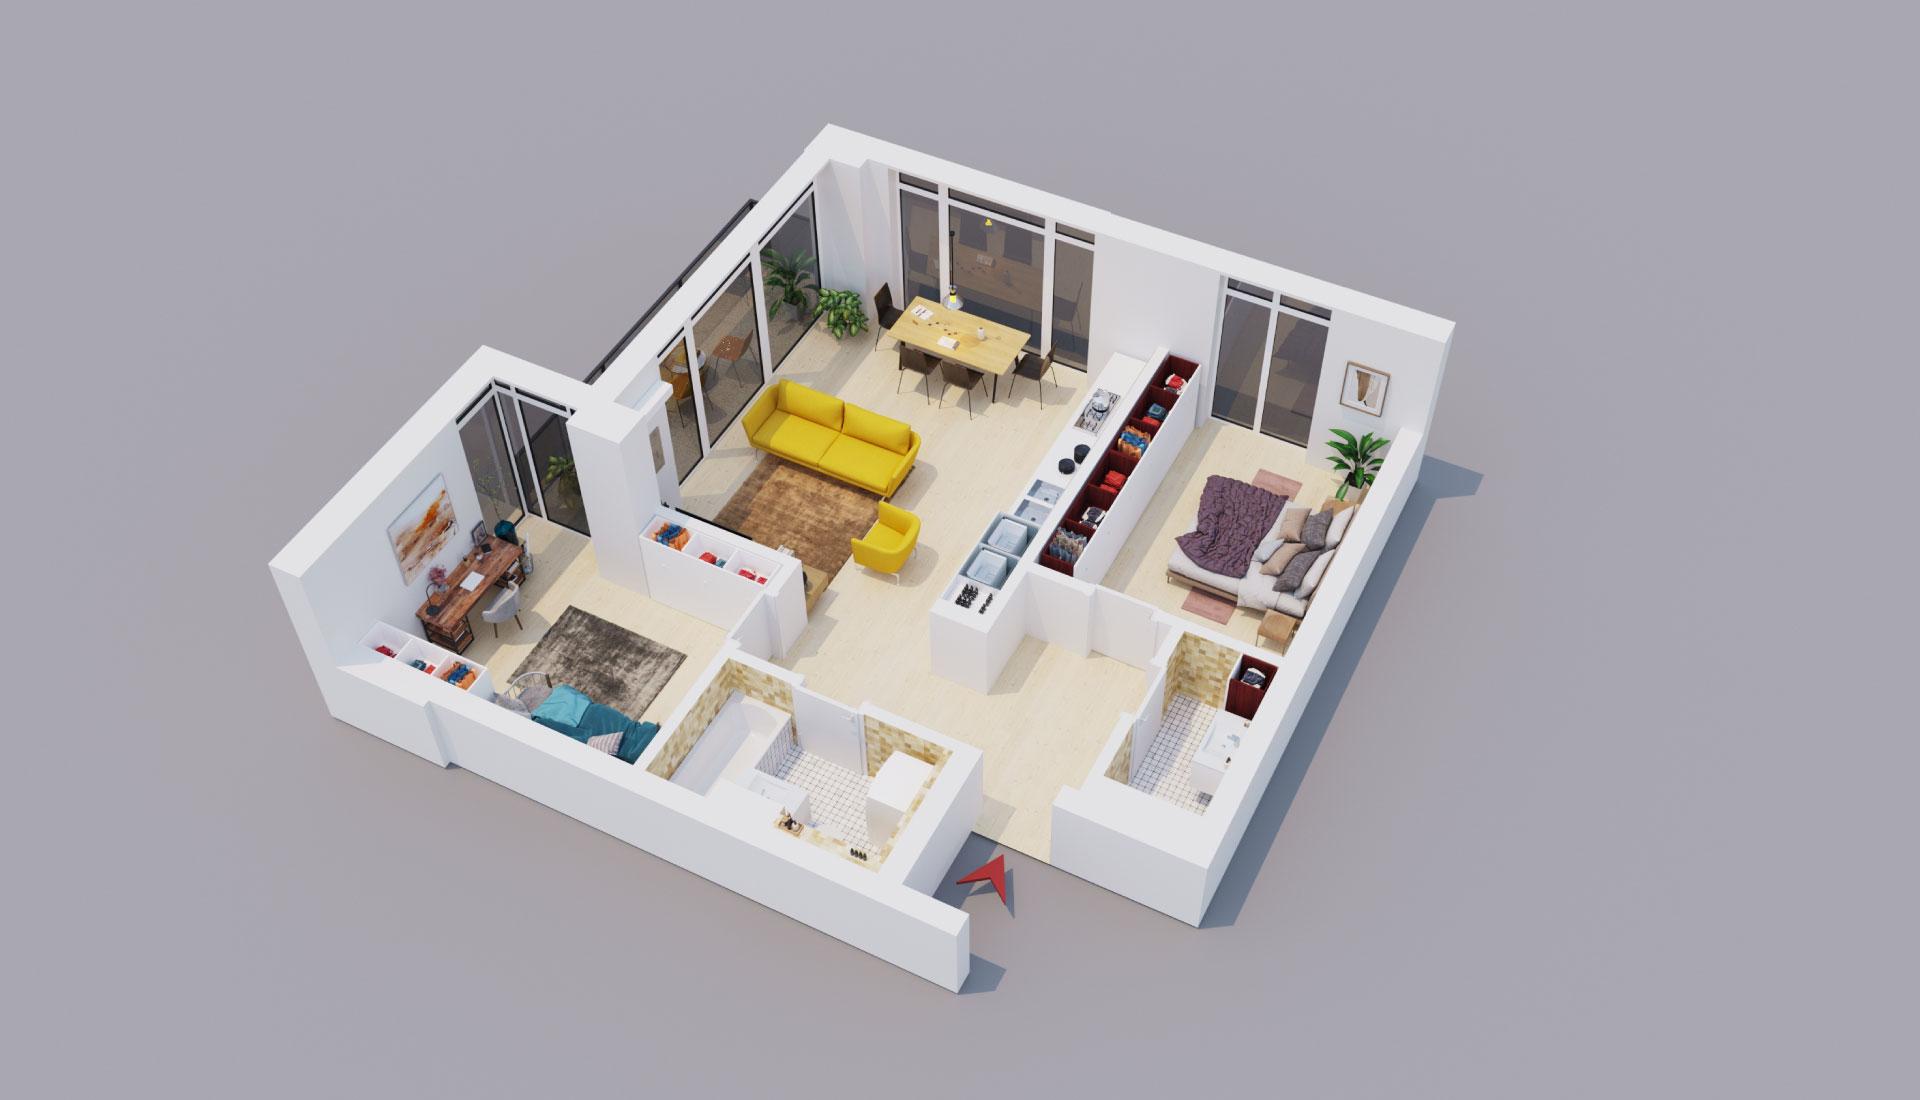 https://nord-one.ro/wp-content/uploads/2021/05/apartament-tic-c-1.jpg